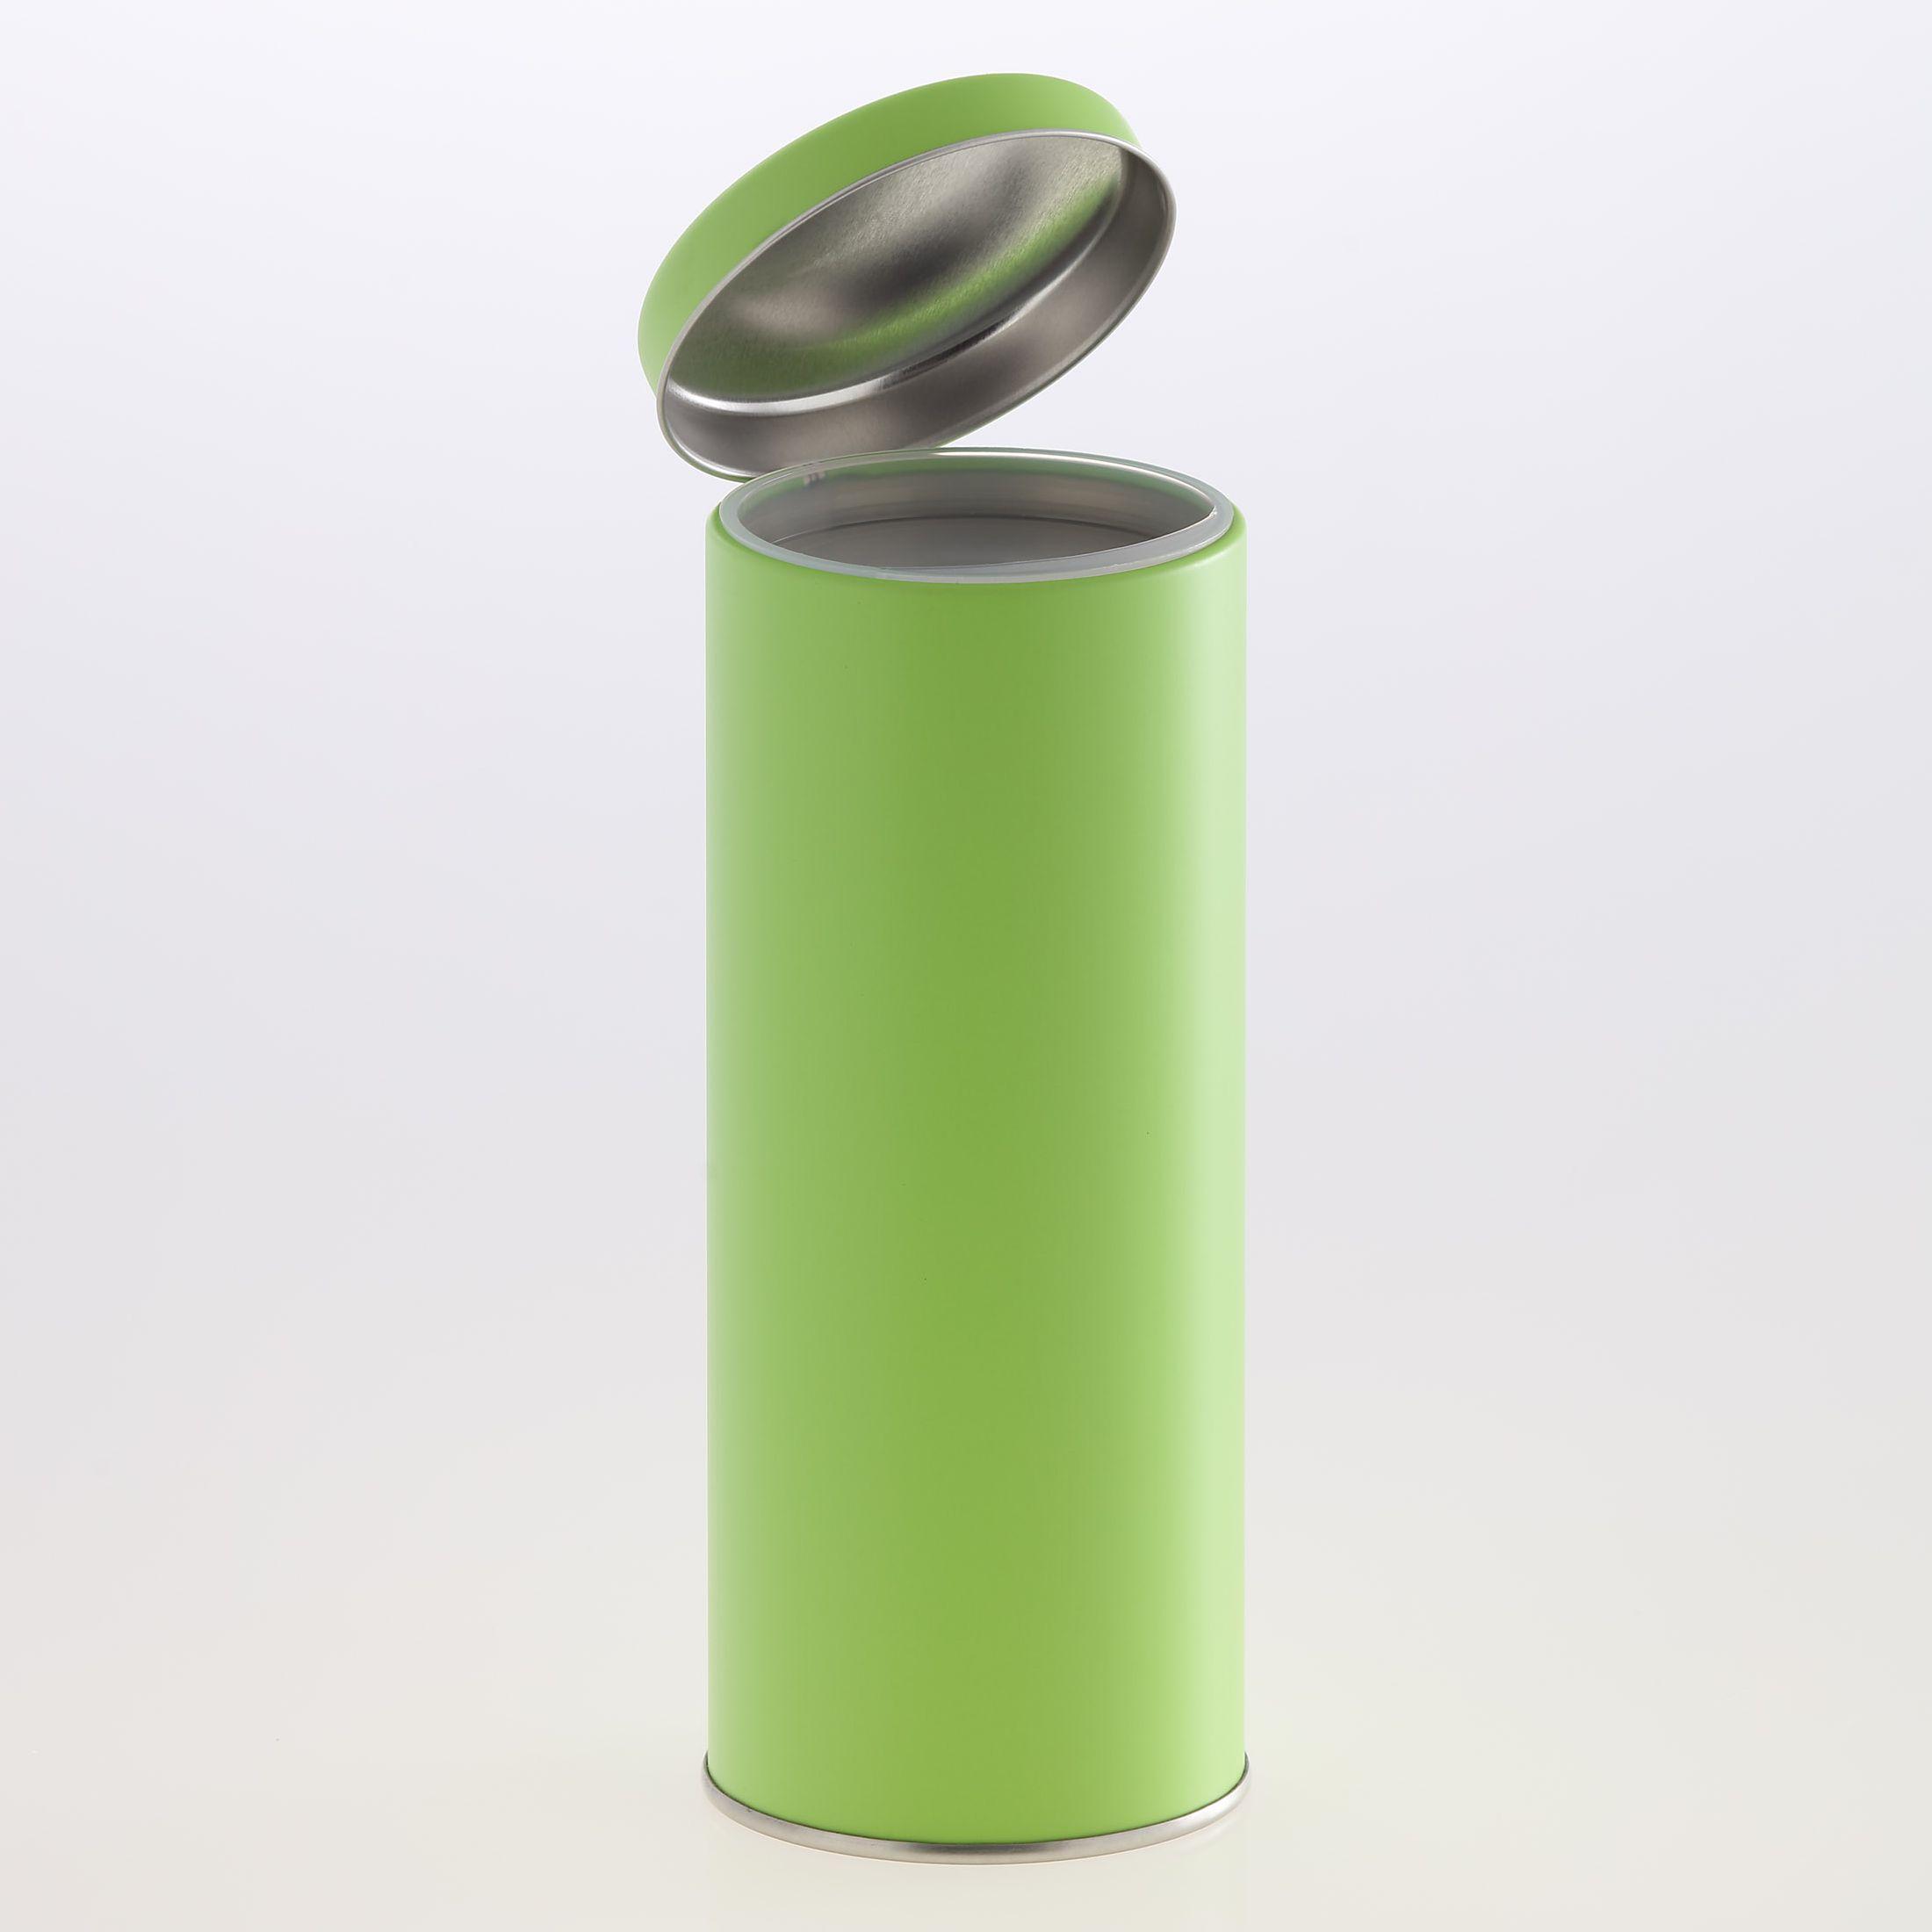 Aroma-Dose 73/180 grün 600 ml !Aktionspreis!